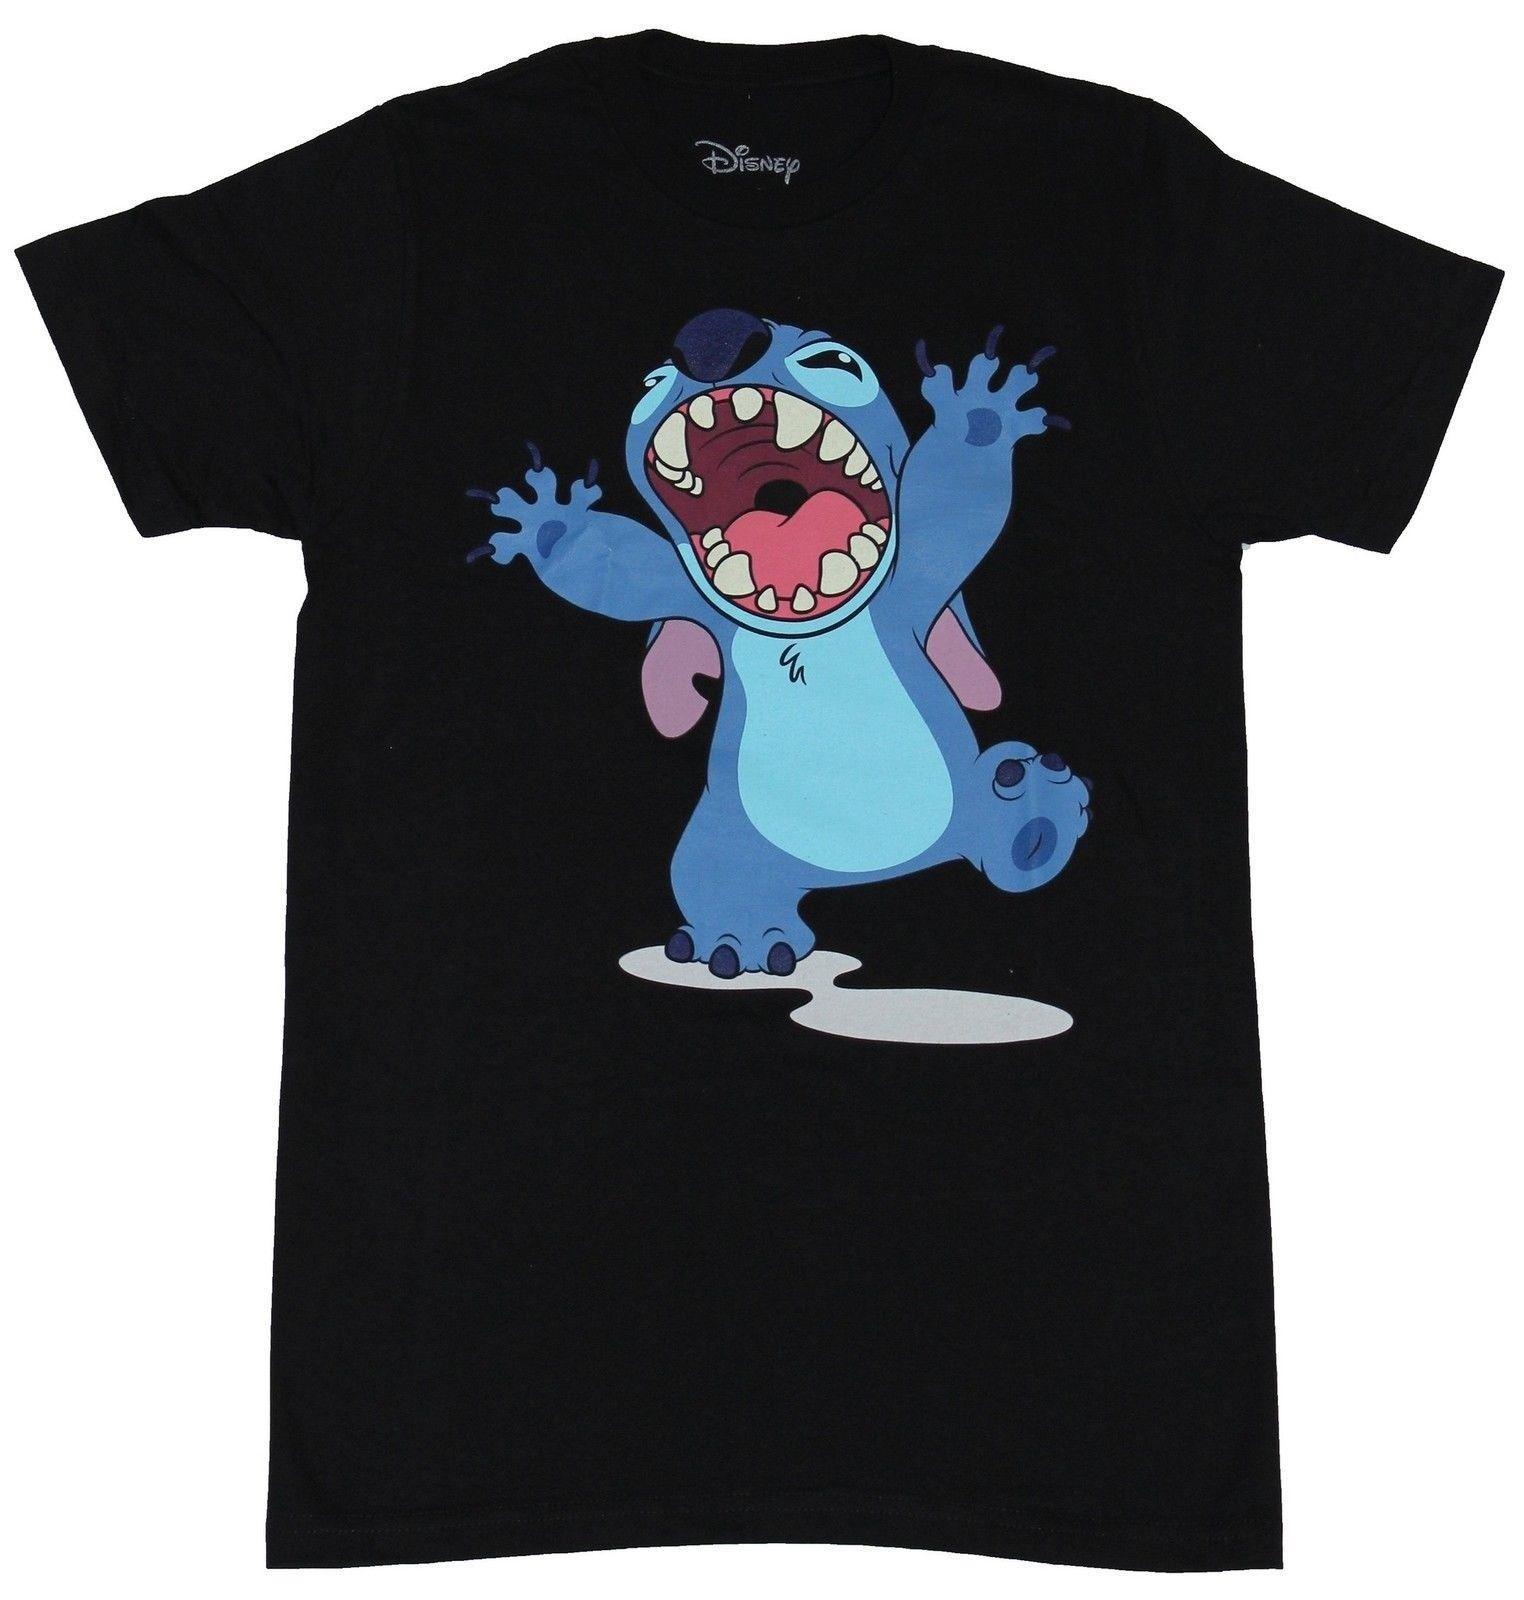 Compre Camiseta Para Chicas Juniors De Lilo Stitch Imagen De Boca Grande  Con Brazos Abiertos A  11.58 Del Cooltshirts50  b10cc78e6a9f1